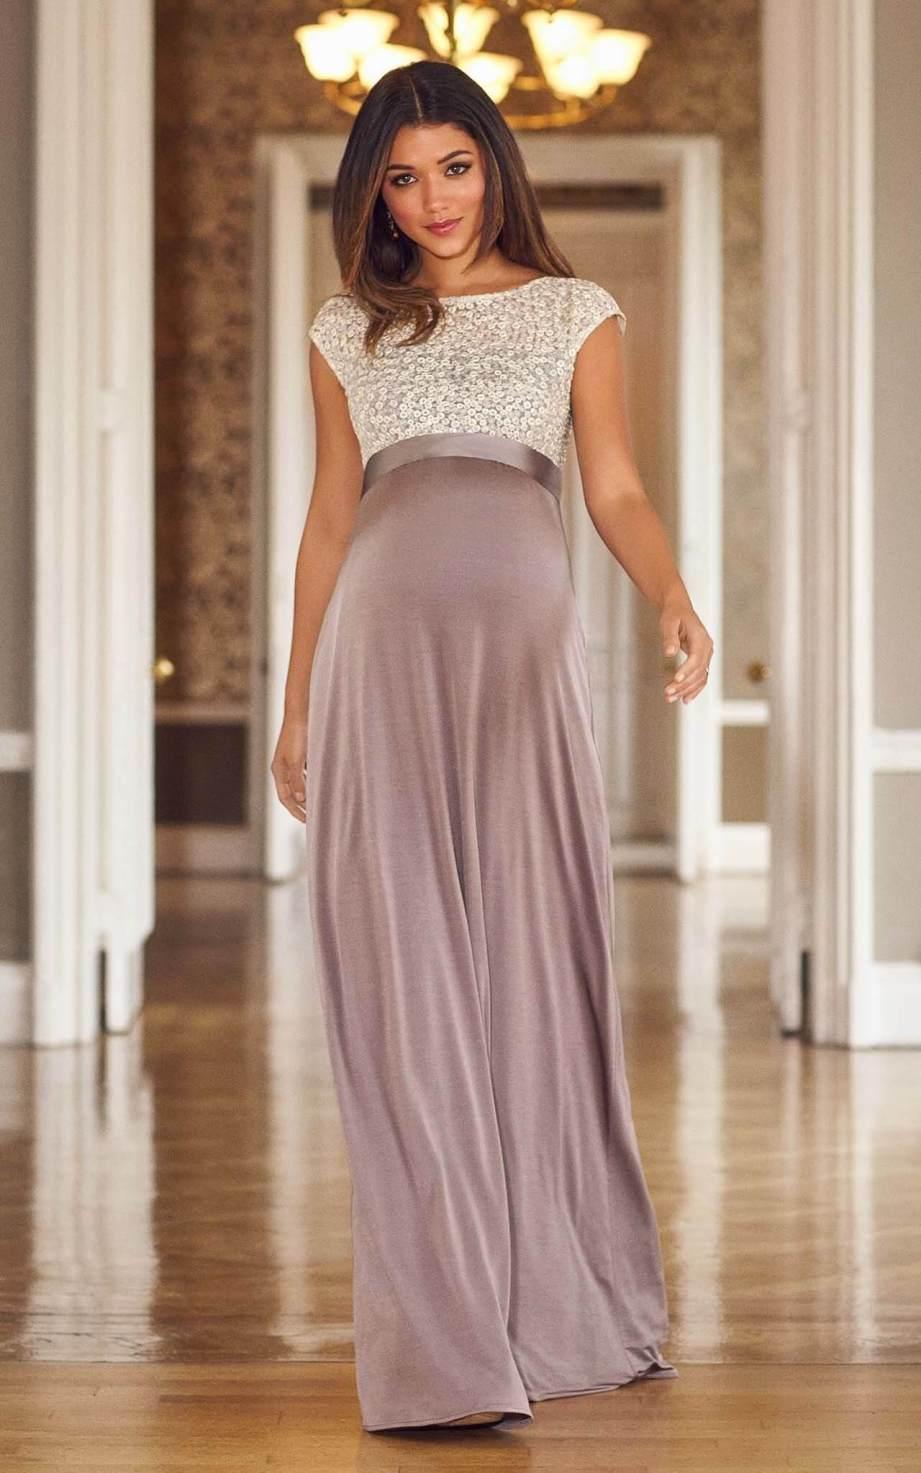 Pregnant model walks towards camera in dusky pink maxi dress